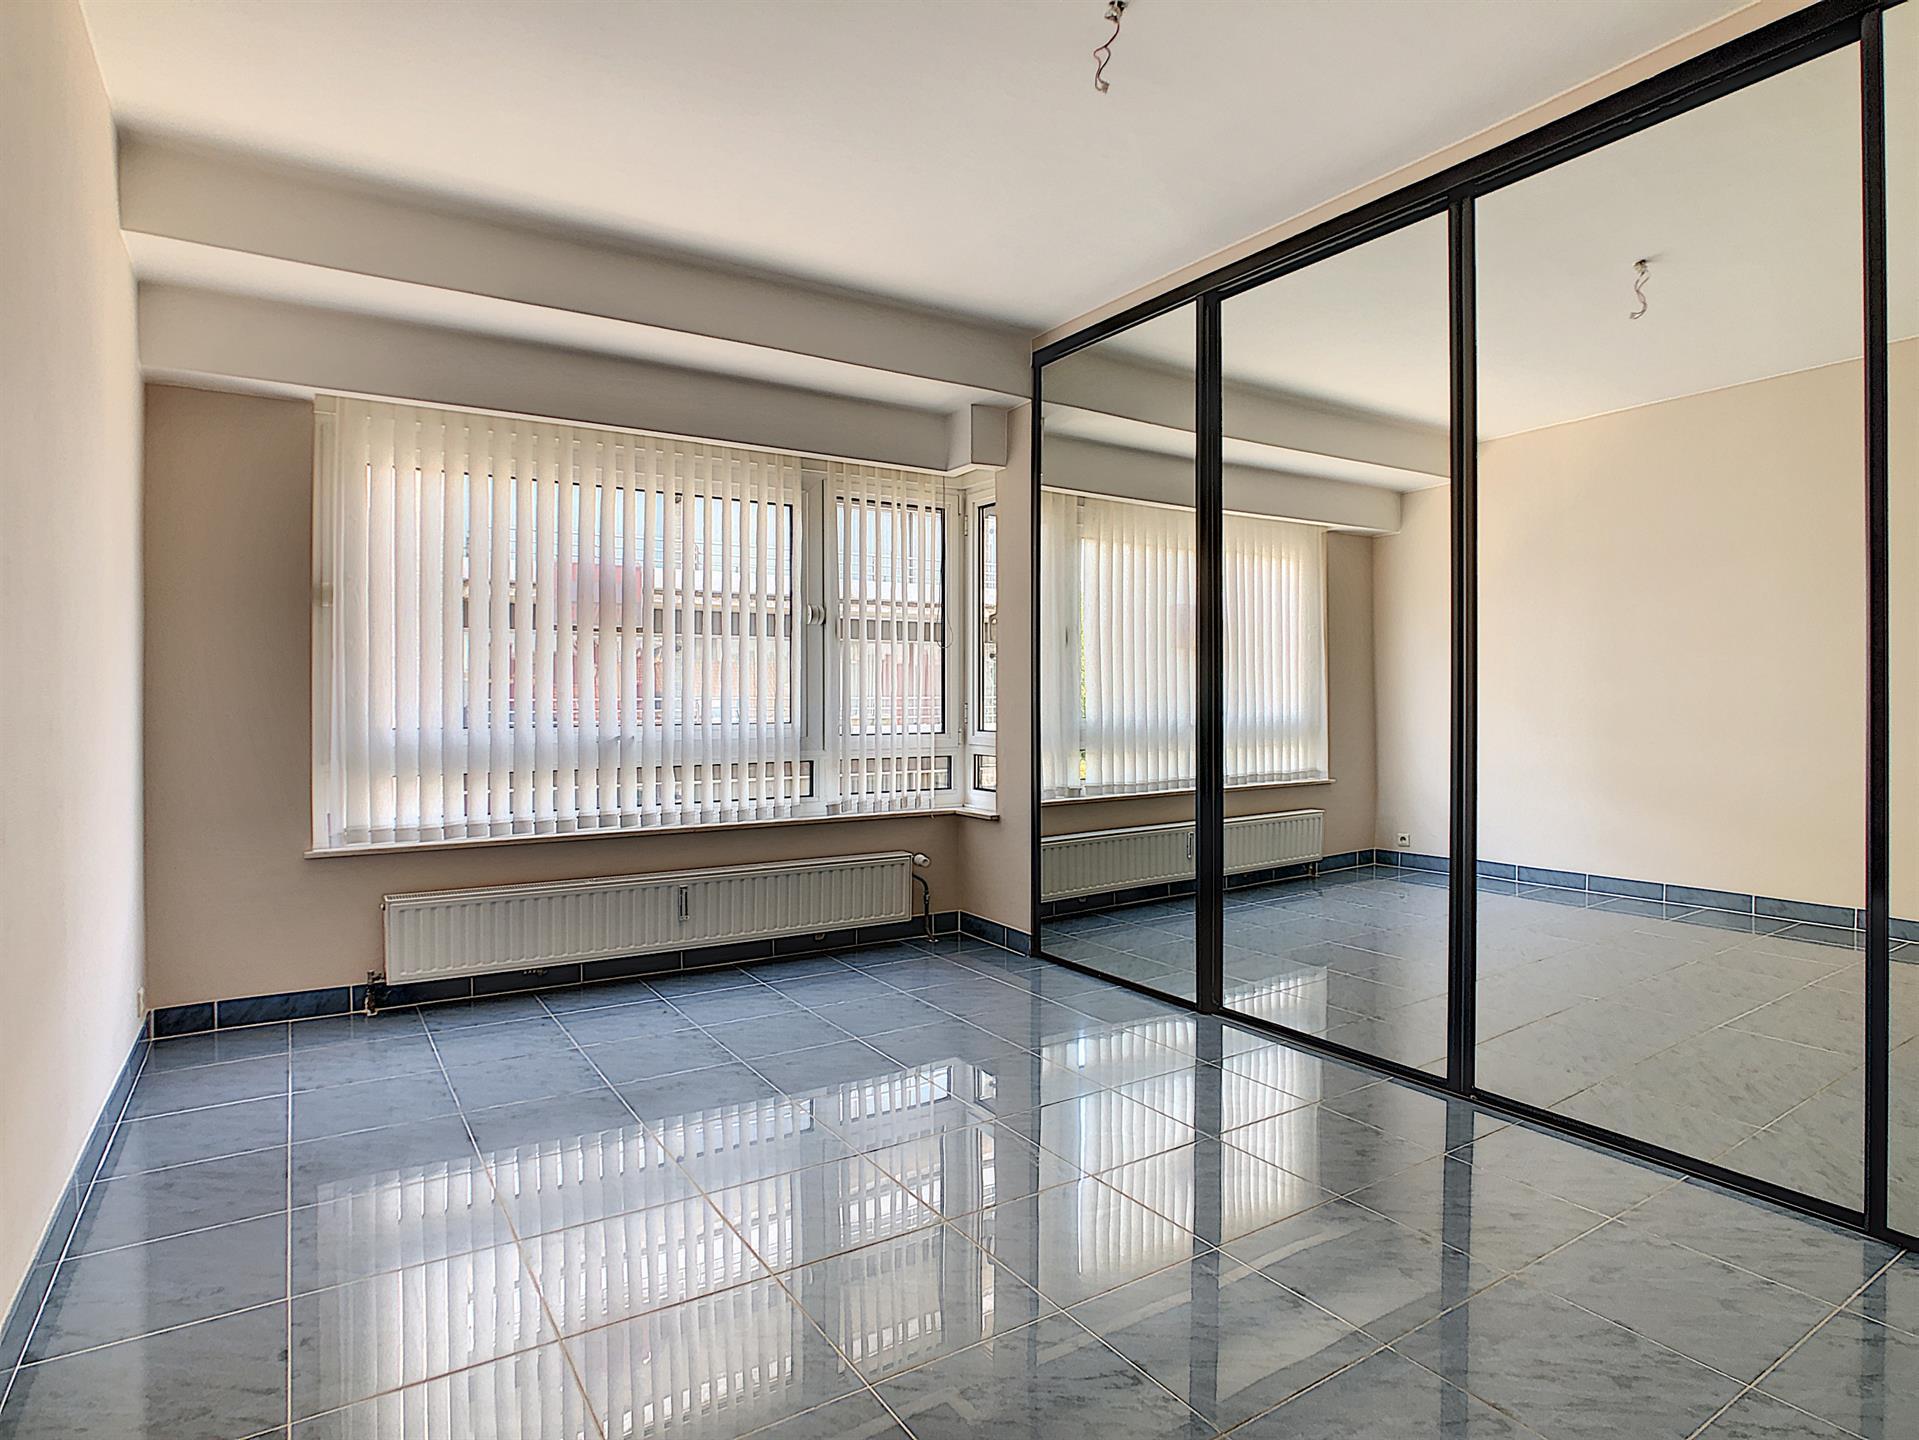 Appartement - Molenbeek-Saint-Jean - #4134416-4